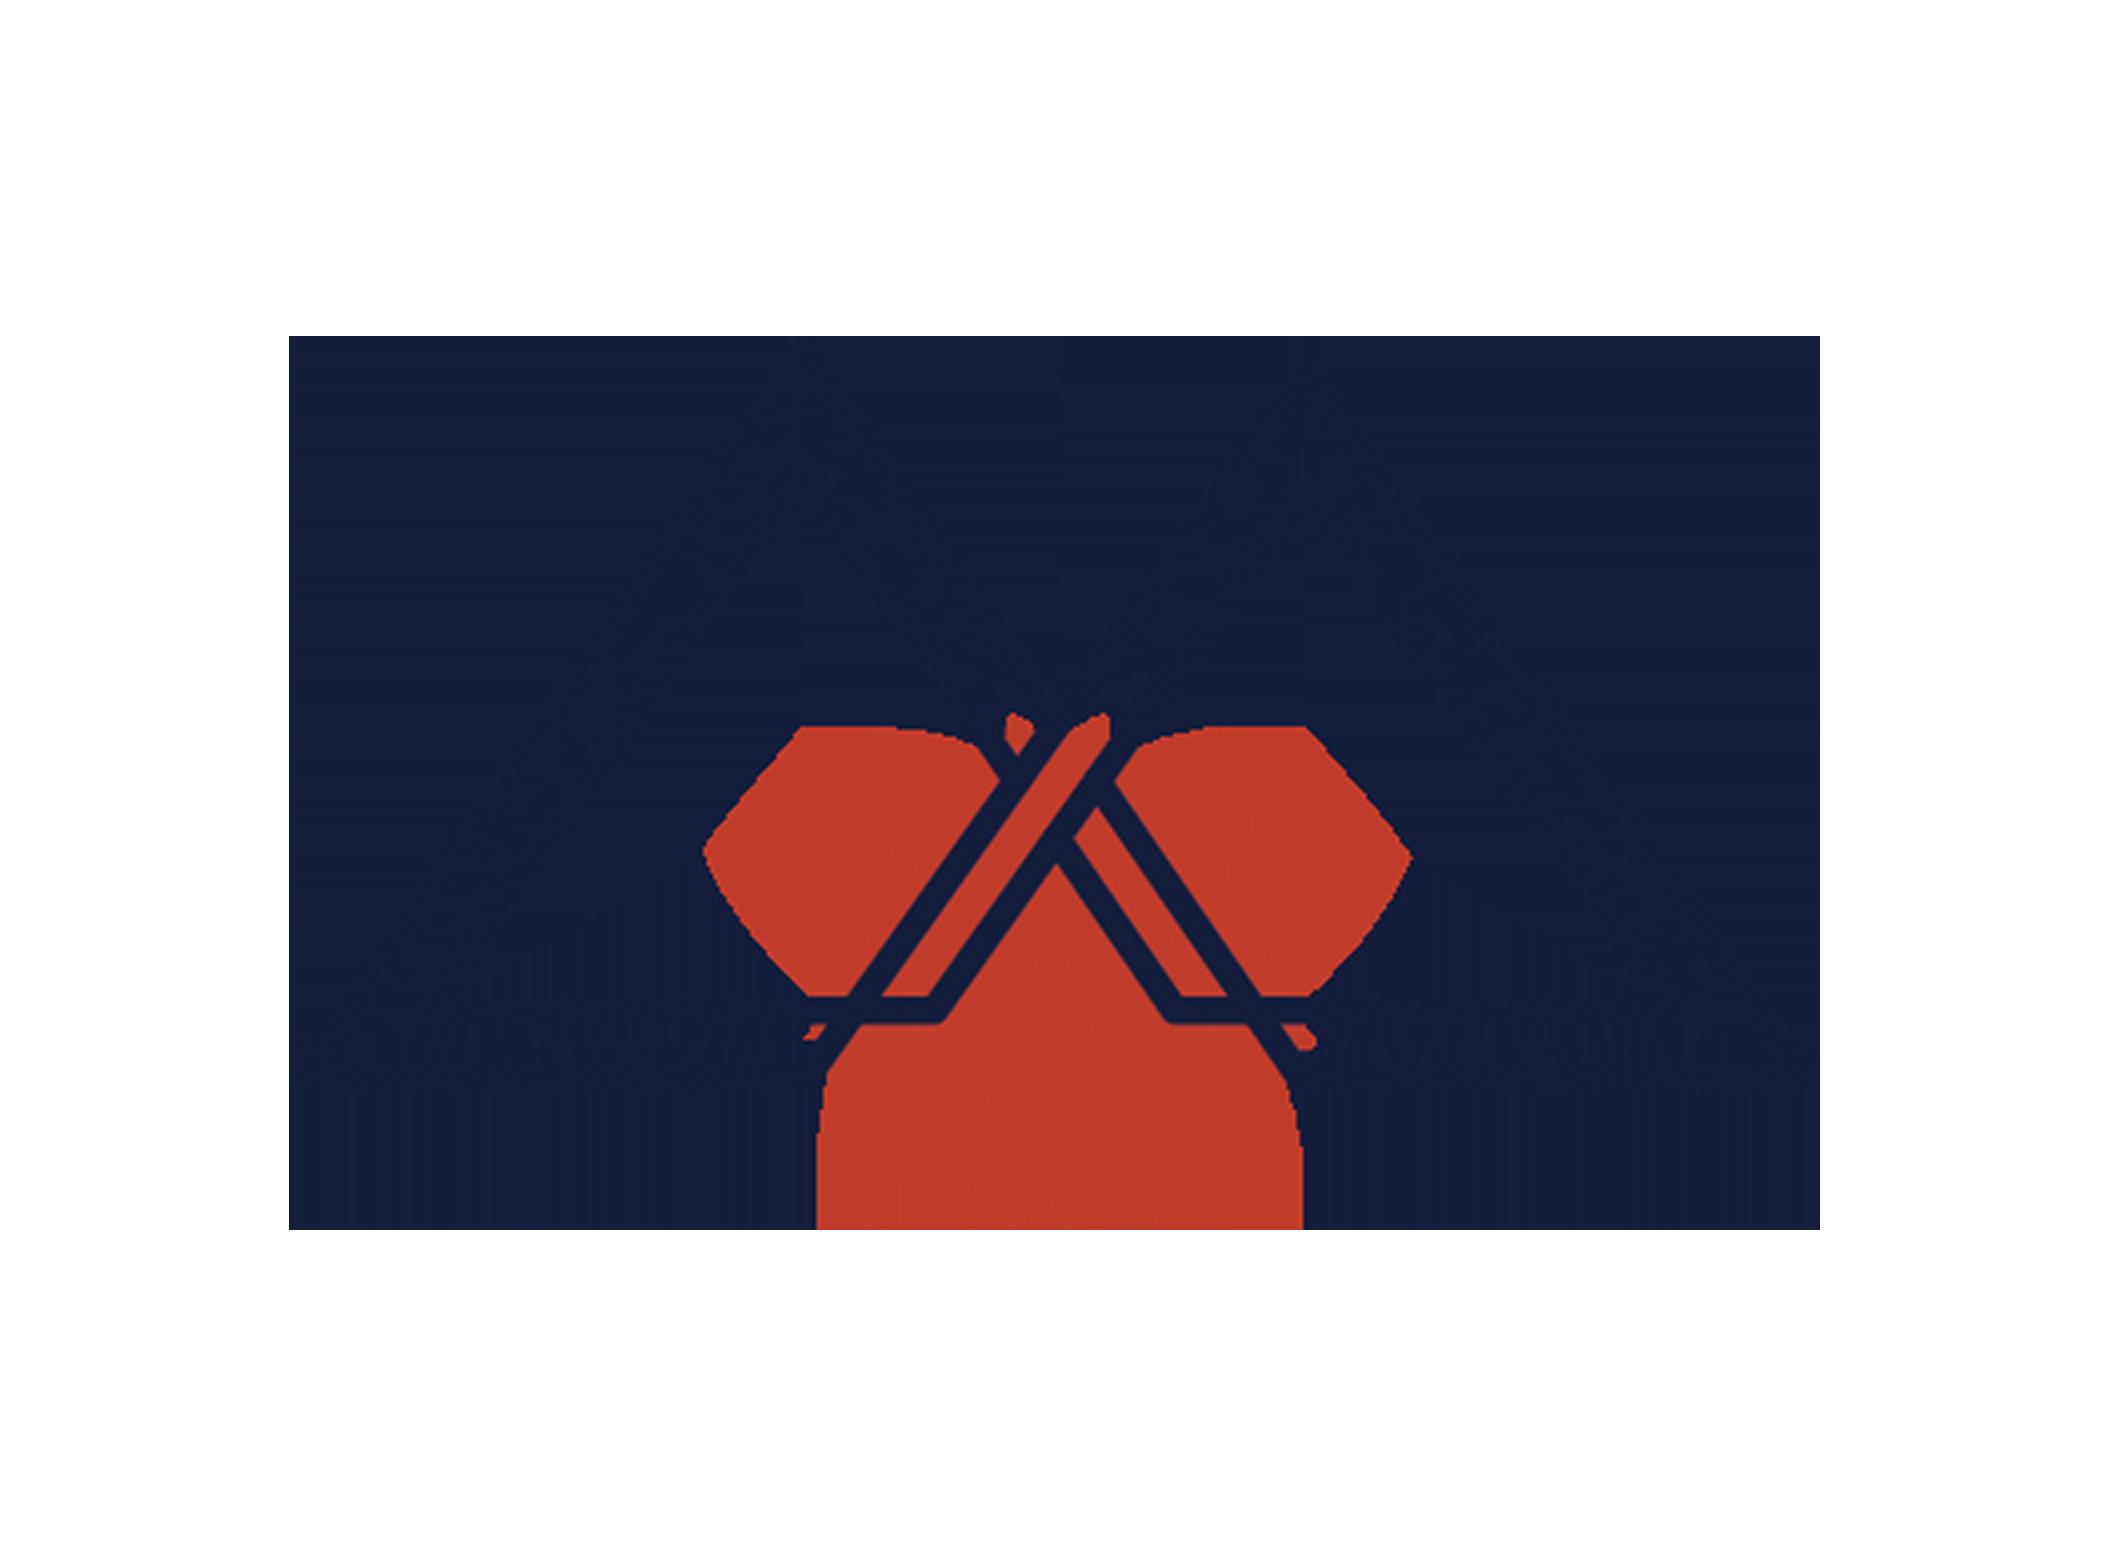 ziggyshoots_logo.png